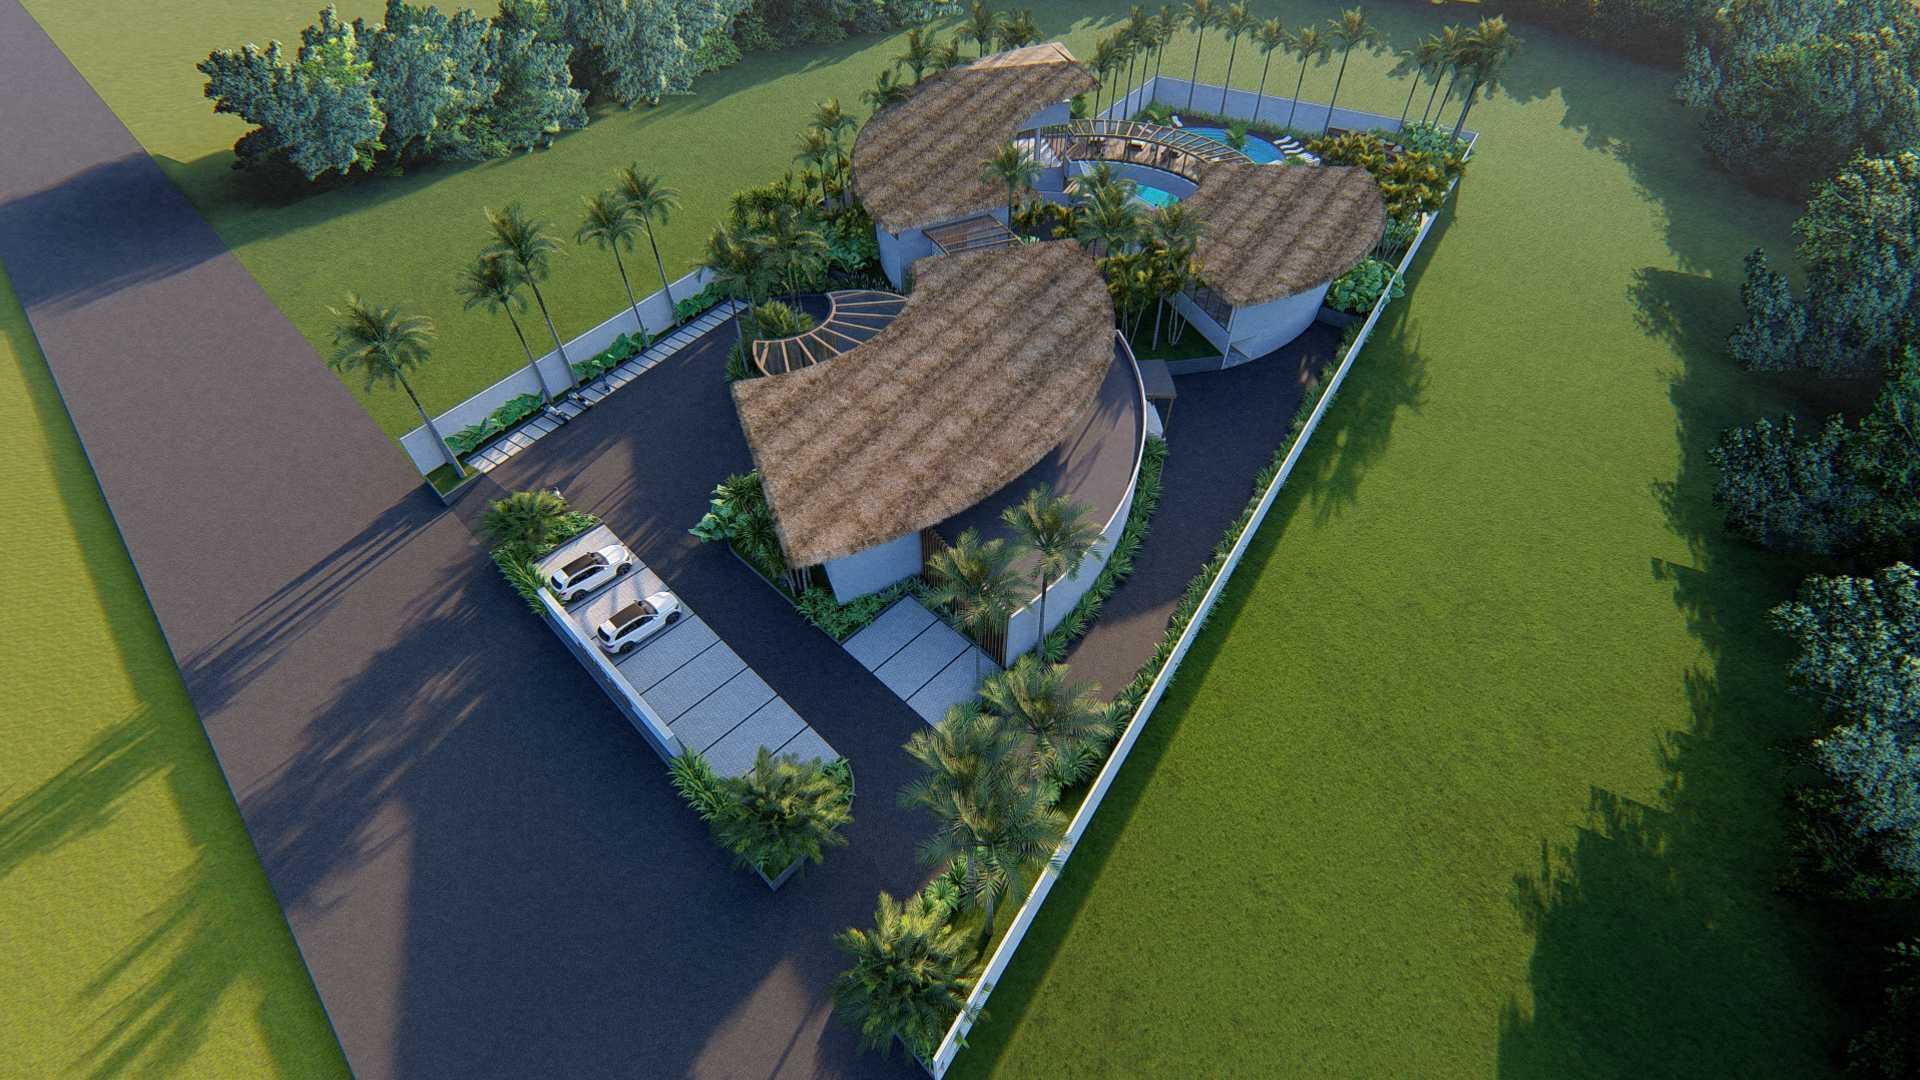 Raaj Gill Arsitek Goethe Club Canggu, Kec. Kuta Utara, Kabupaten Badung, Bali, Indonesia Bali, Indonesia Raaj-Gill-Arsitek-Studio-Bali  102242